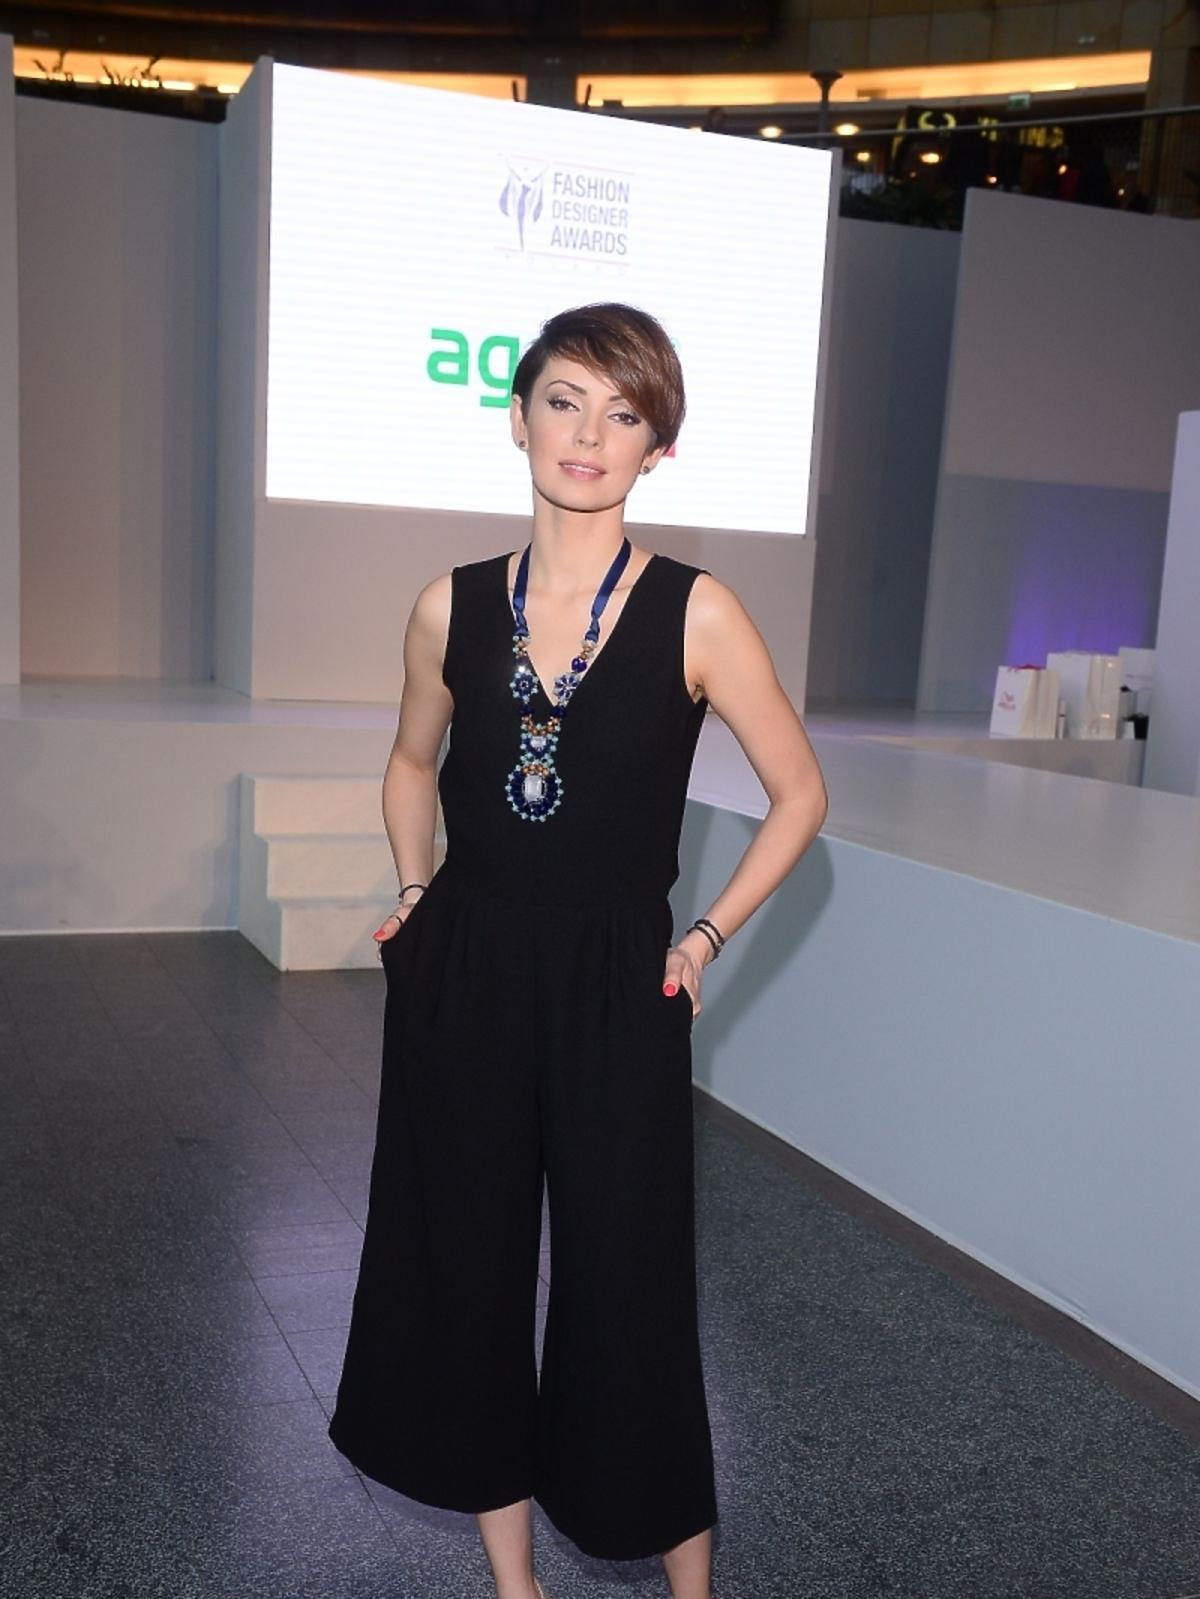 Dorota Gardias na imprezie Fashion Designer Awards